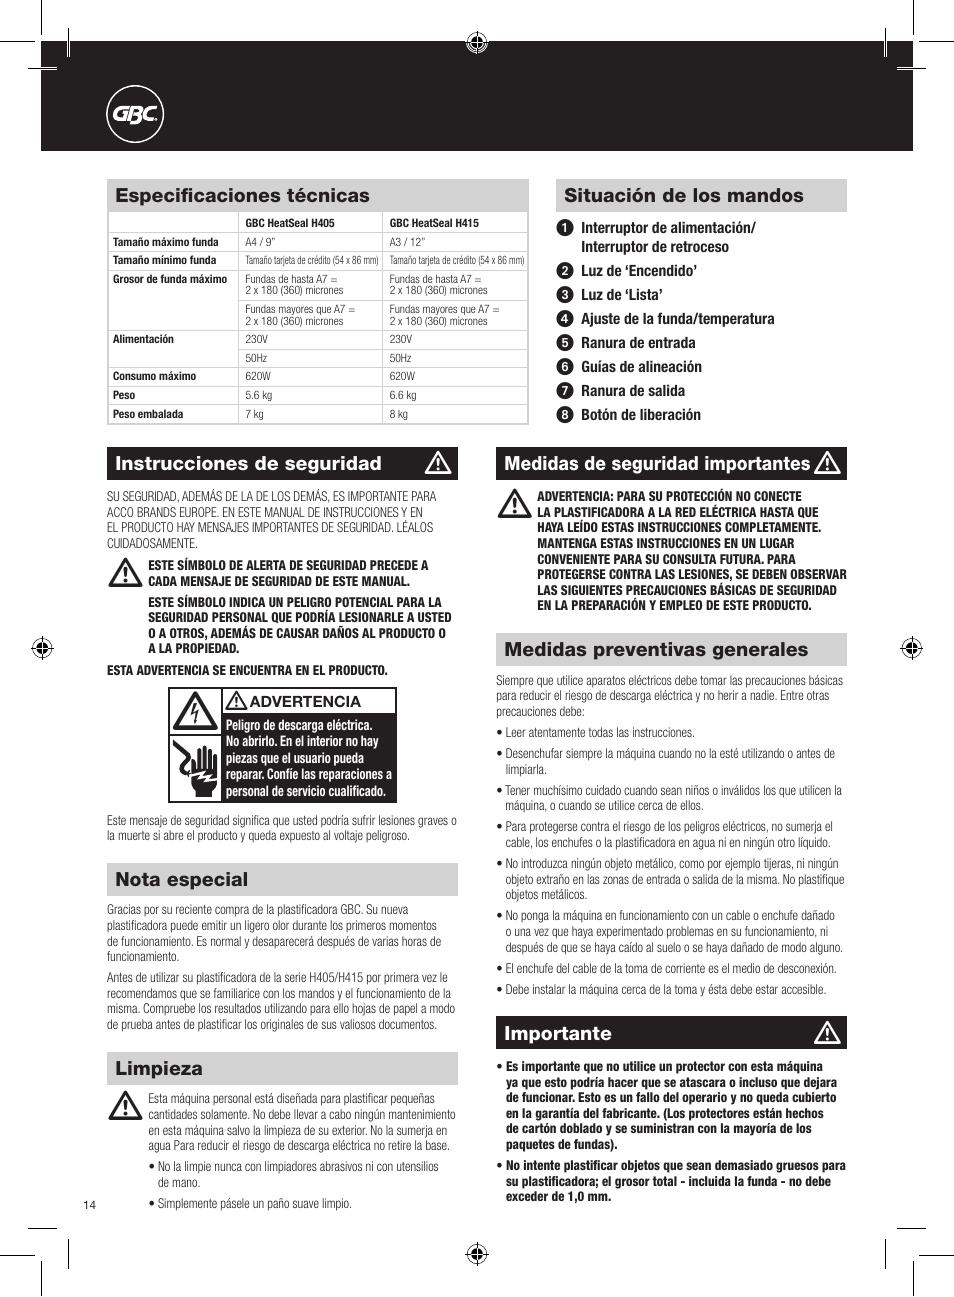 gbc h415 heatseal user manual page 14 38 original mode also rh manualsdir com gbc user manual c400e gbc laminator user manual